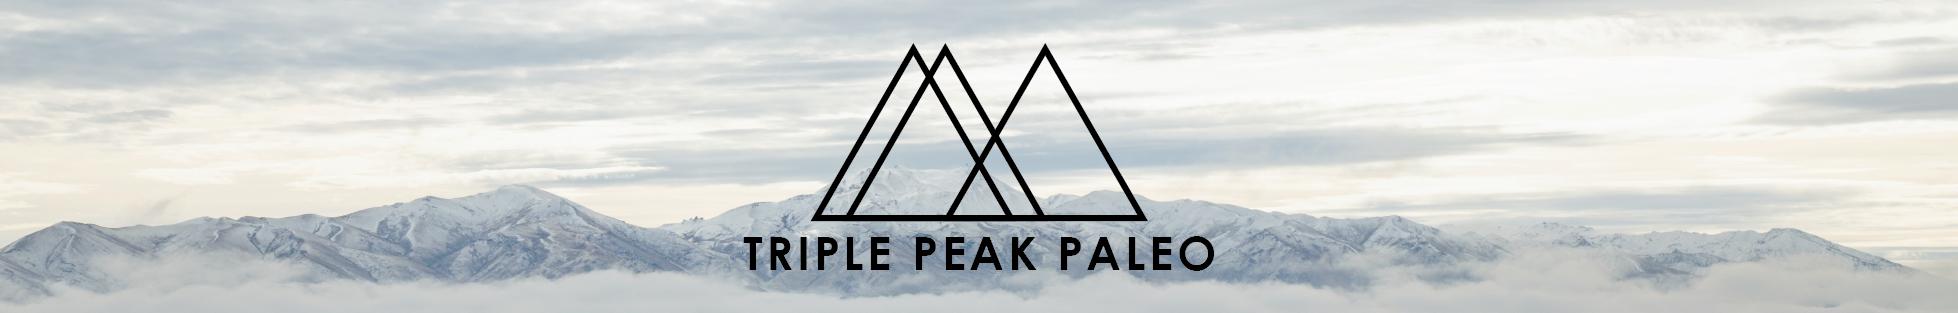 Triple Peak Paleo Logo Mountain Website Banner